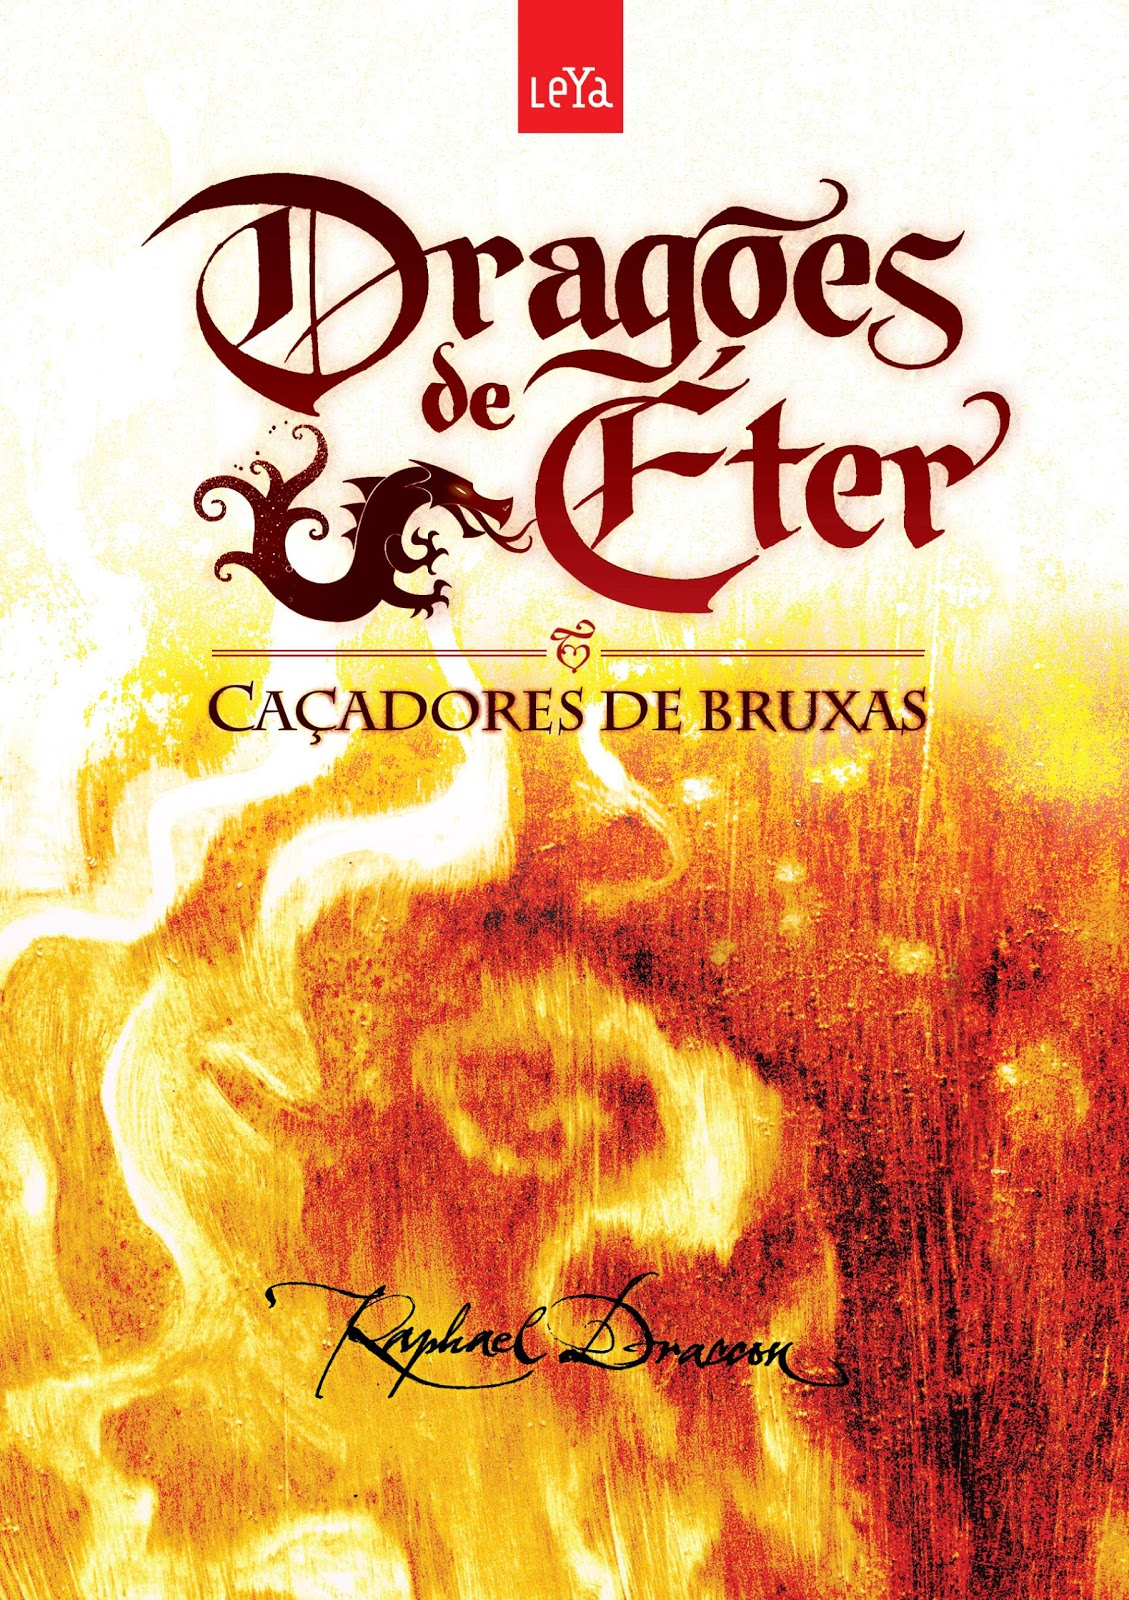 2010 novembro raphael draccon drages de ter no o olhar do drago fandeluxe Gallery